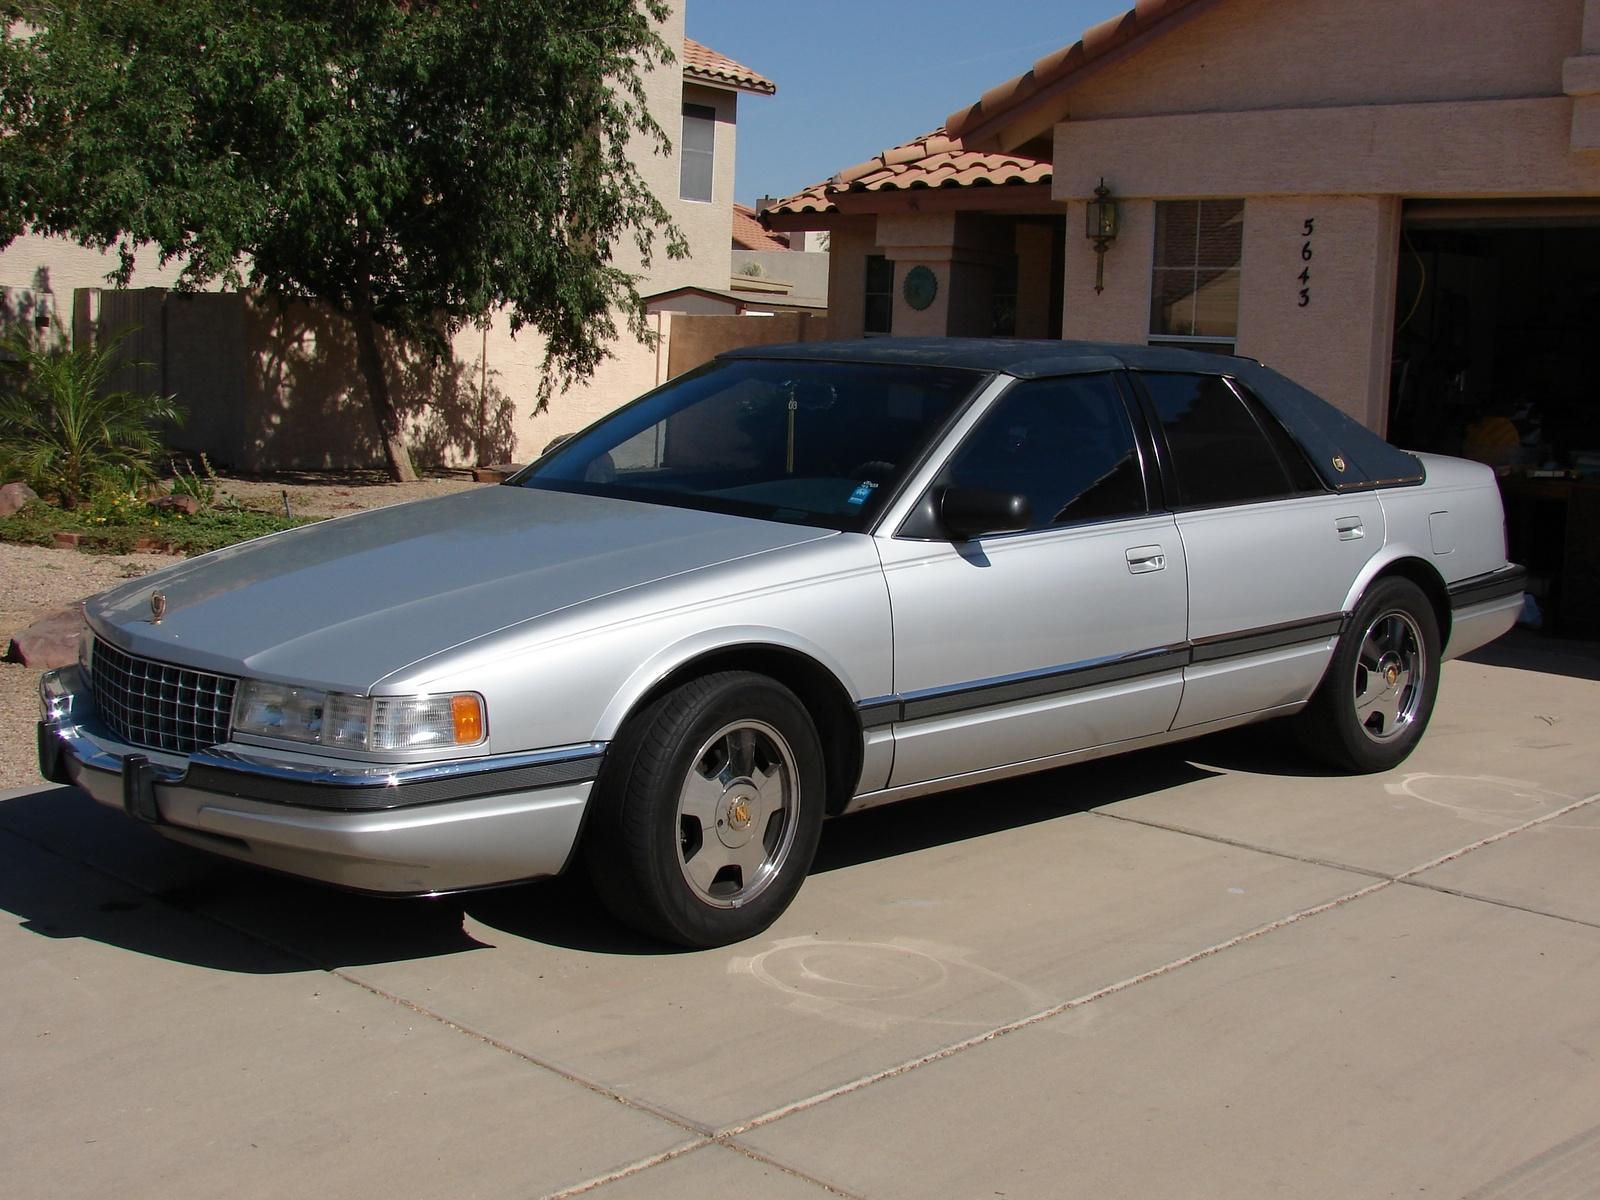 Cadillac Seville 1998 foto - 3